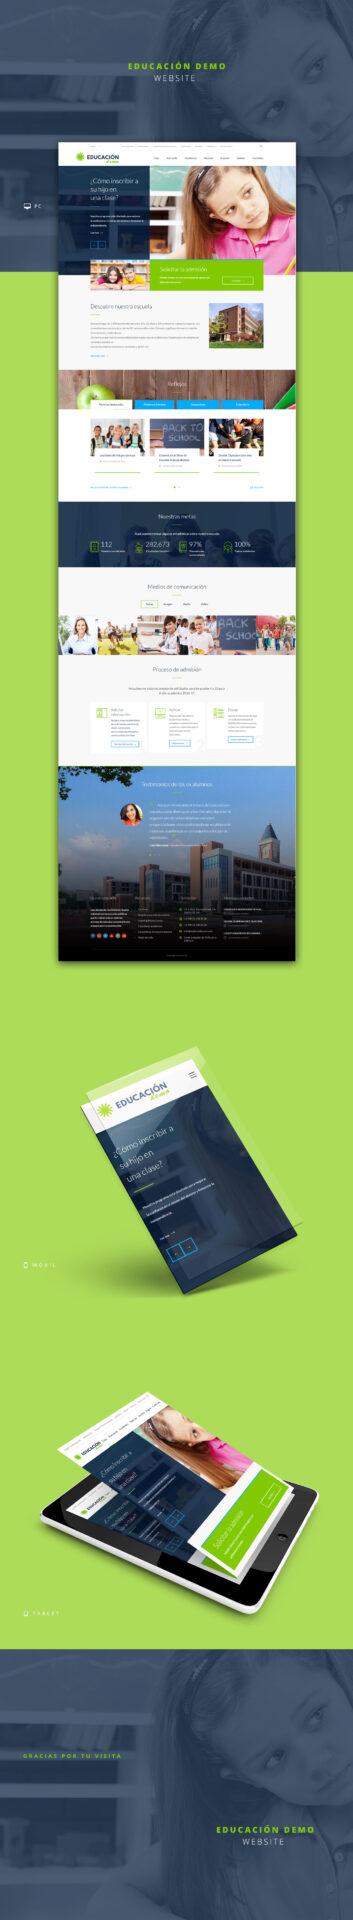 Pagina-web-eduacion-ecuador